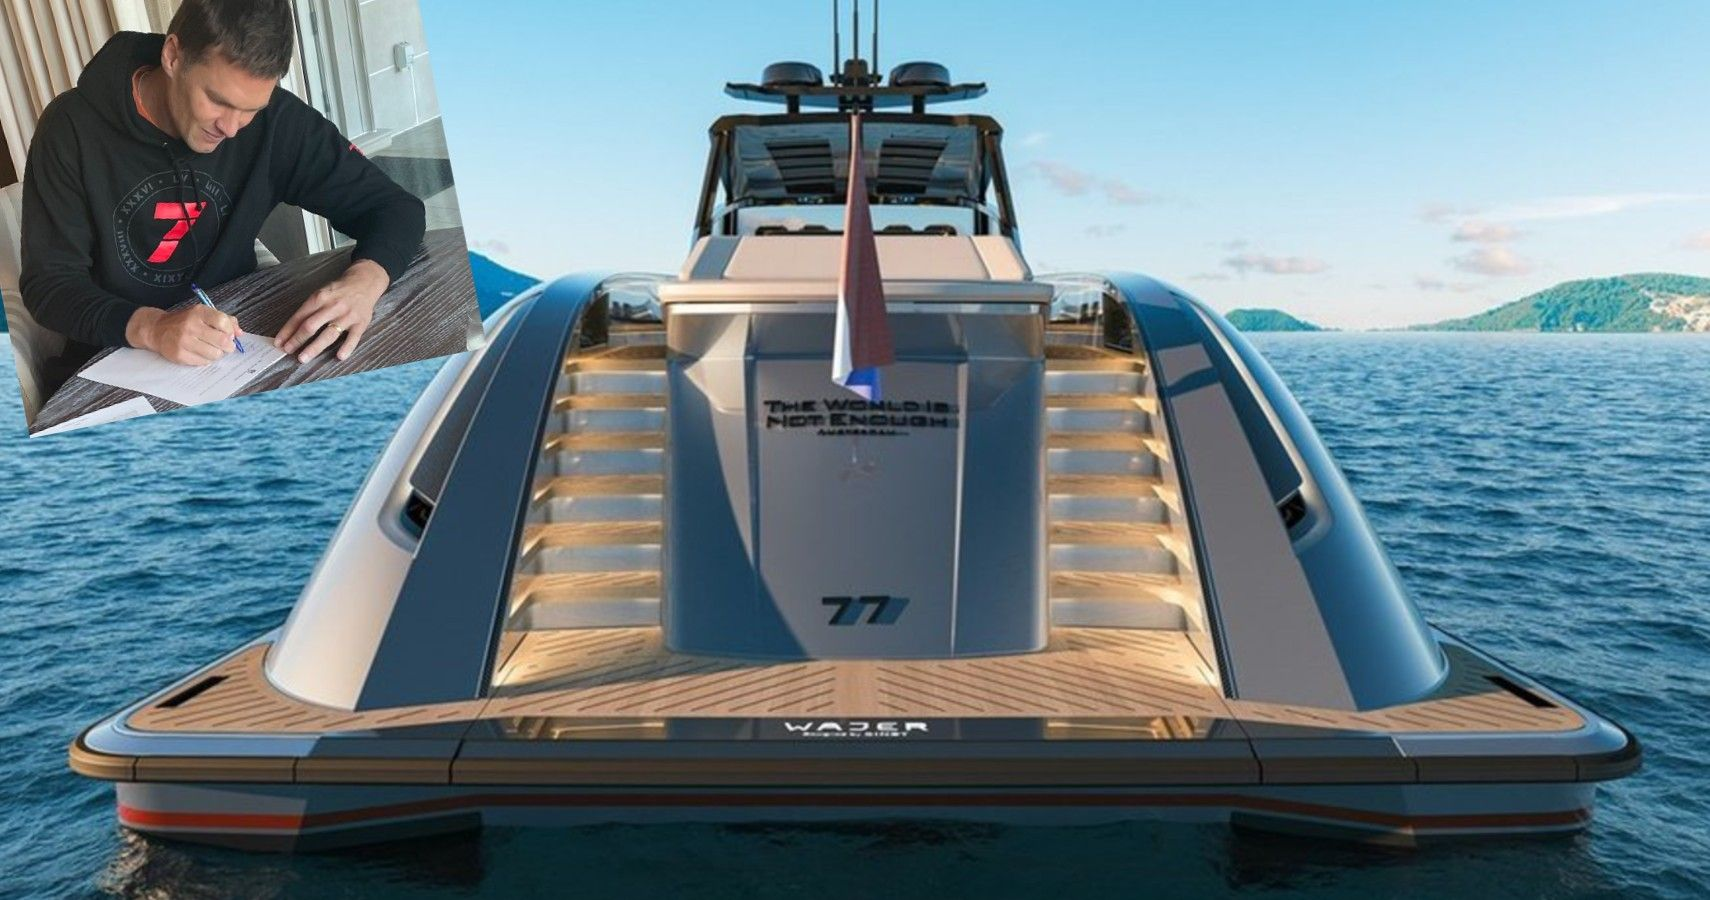 Tom Brady Upgrades To $6 Million Yacht | TheRichest.com